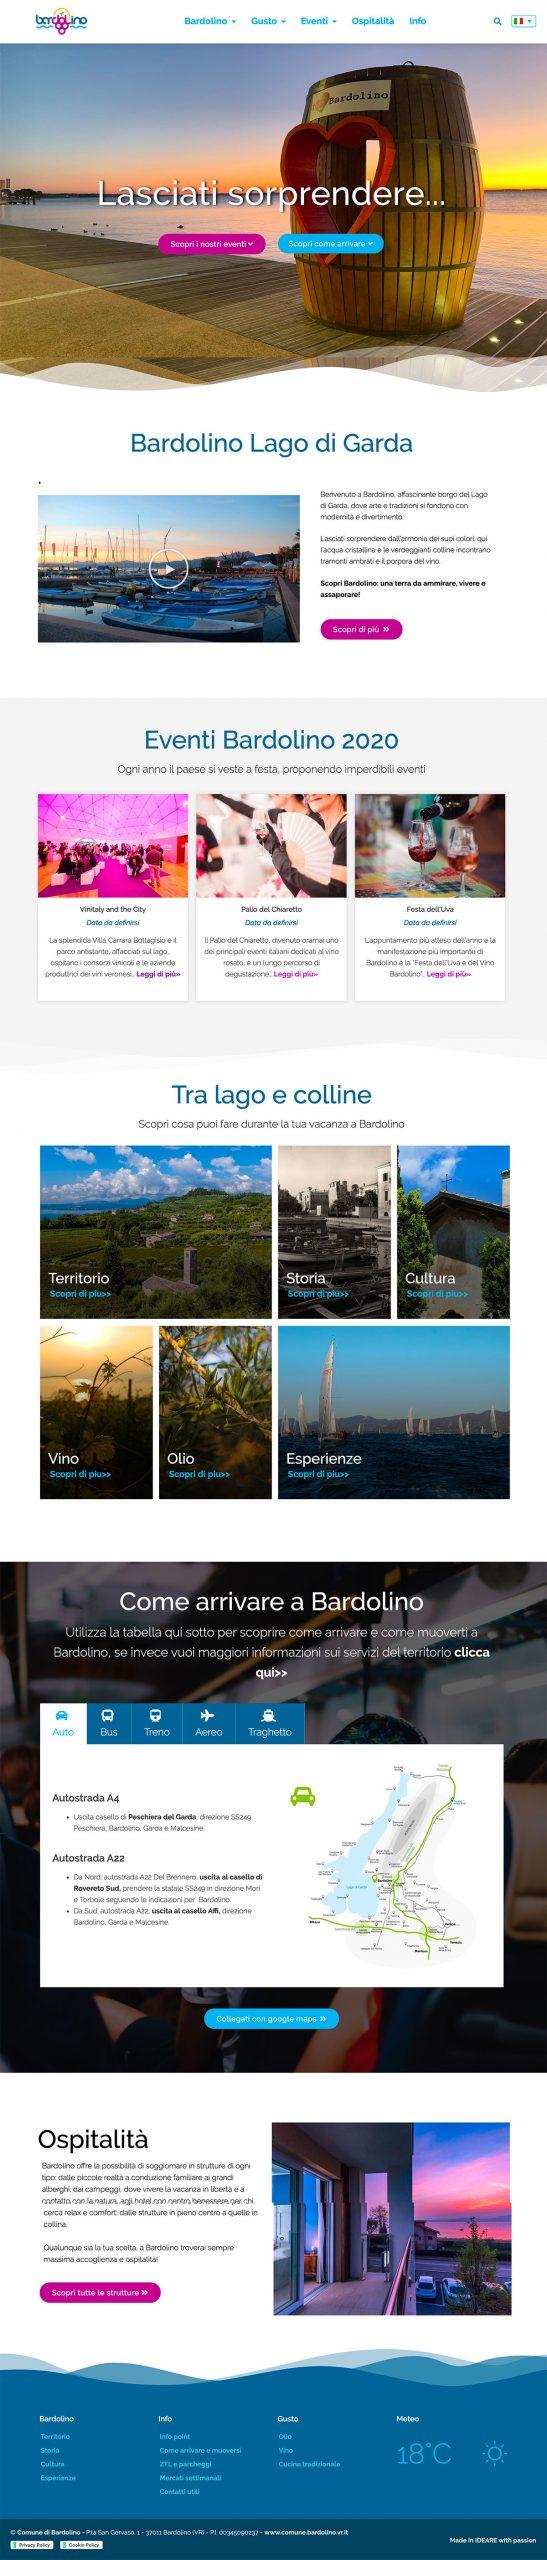 sitiweb-visitbardolino